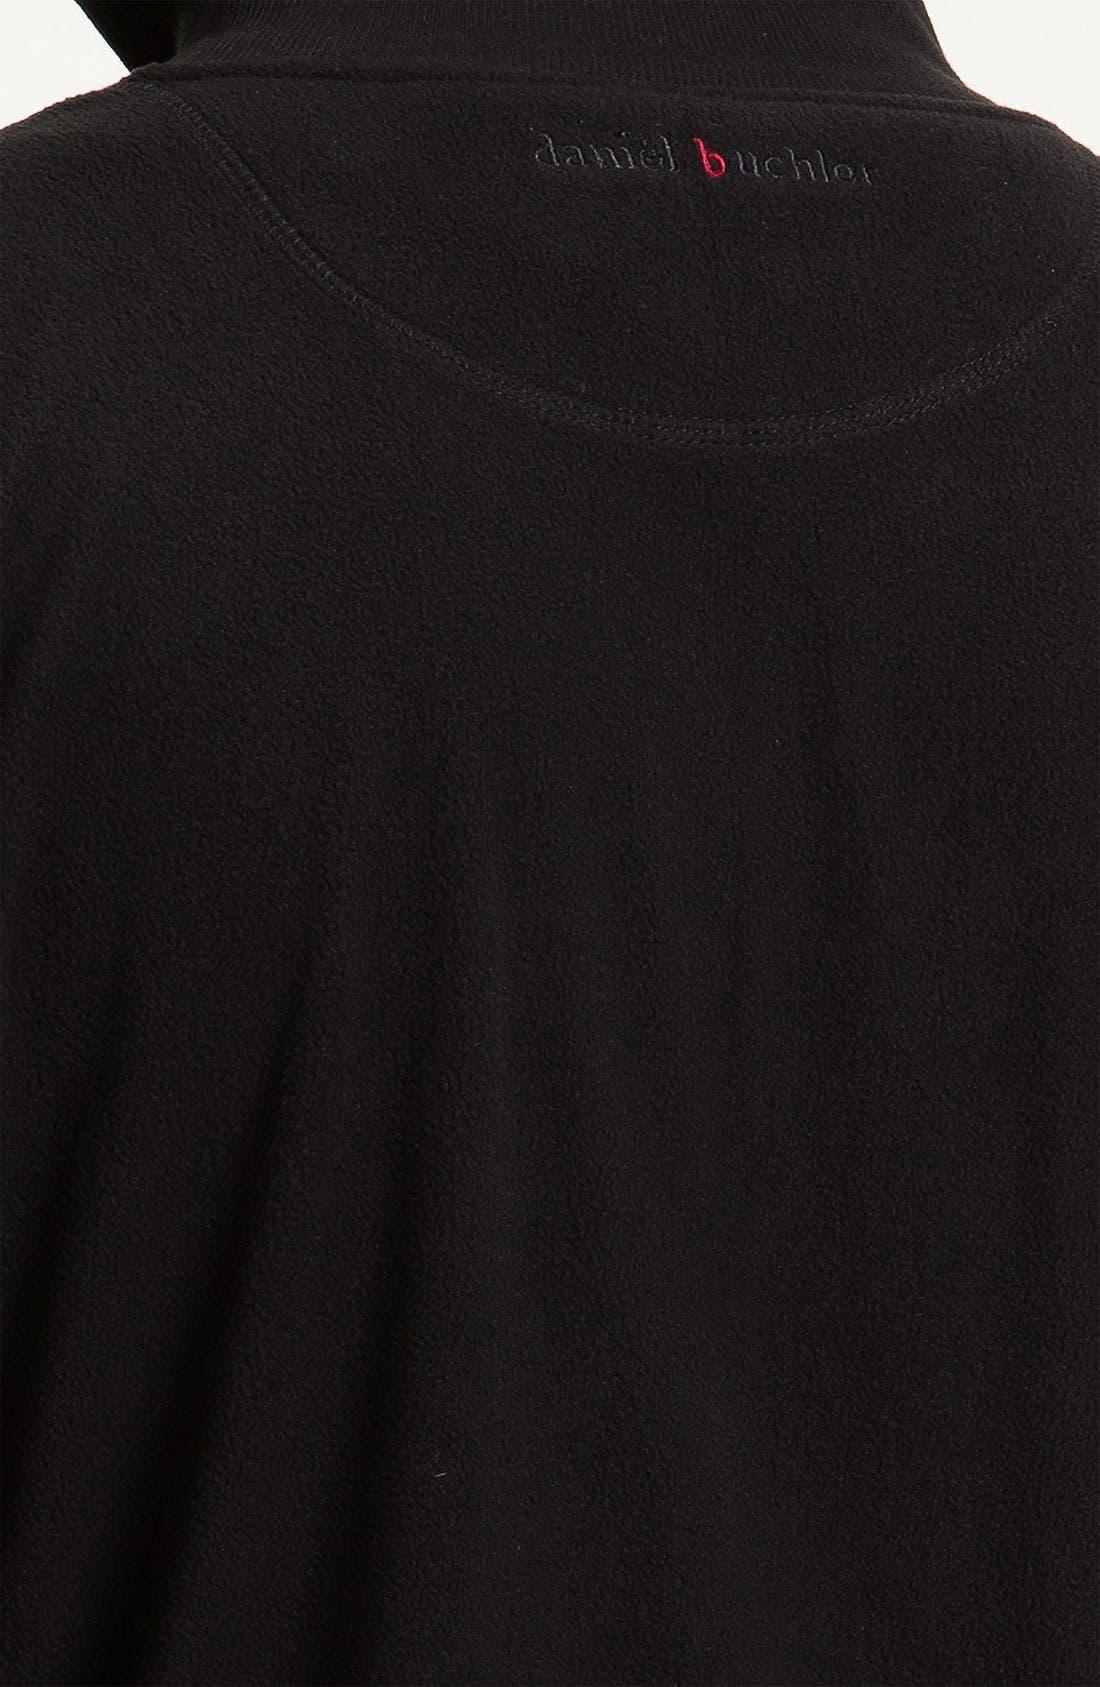 Alternate Image 3  - Daniel Buchler Lightweight Fleece Track Jacket